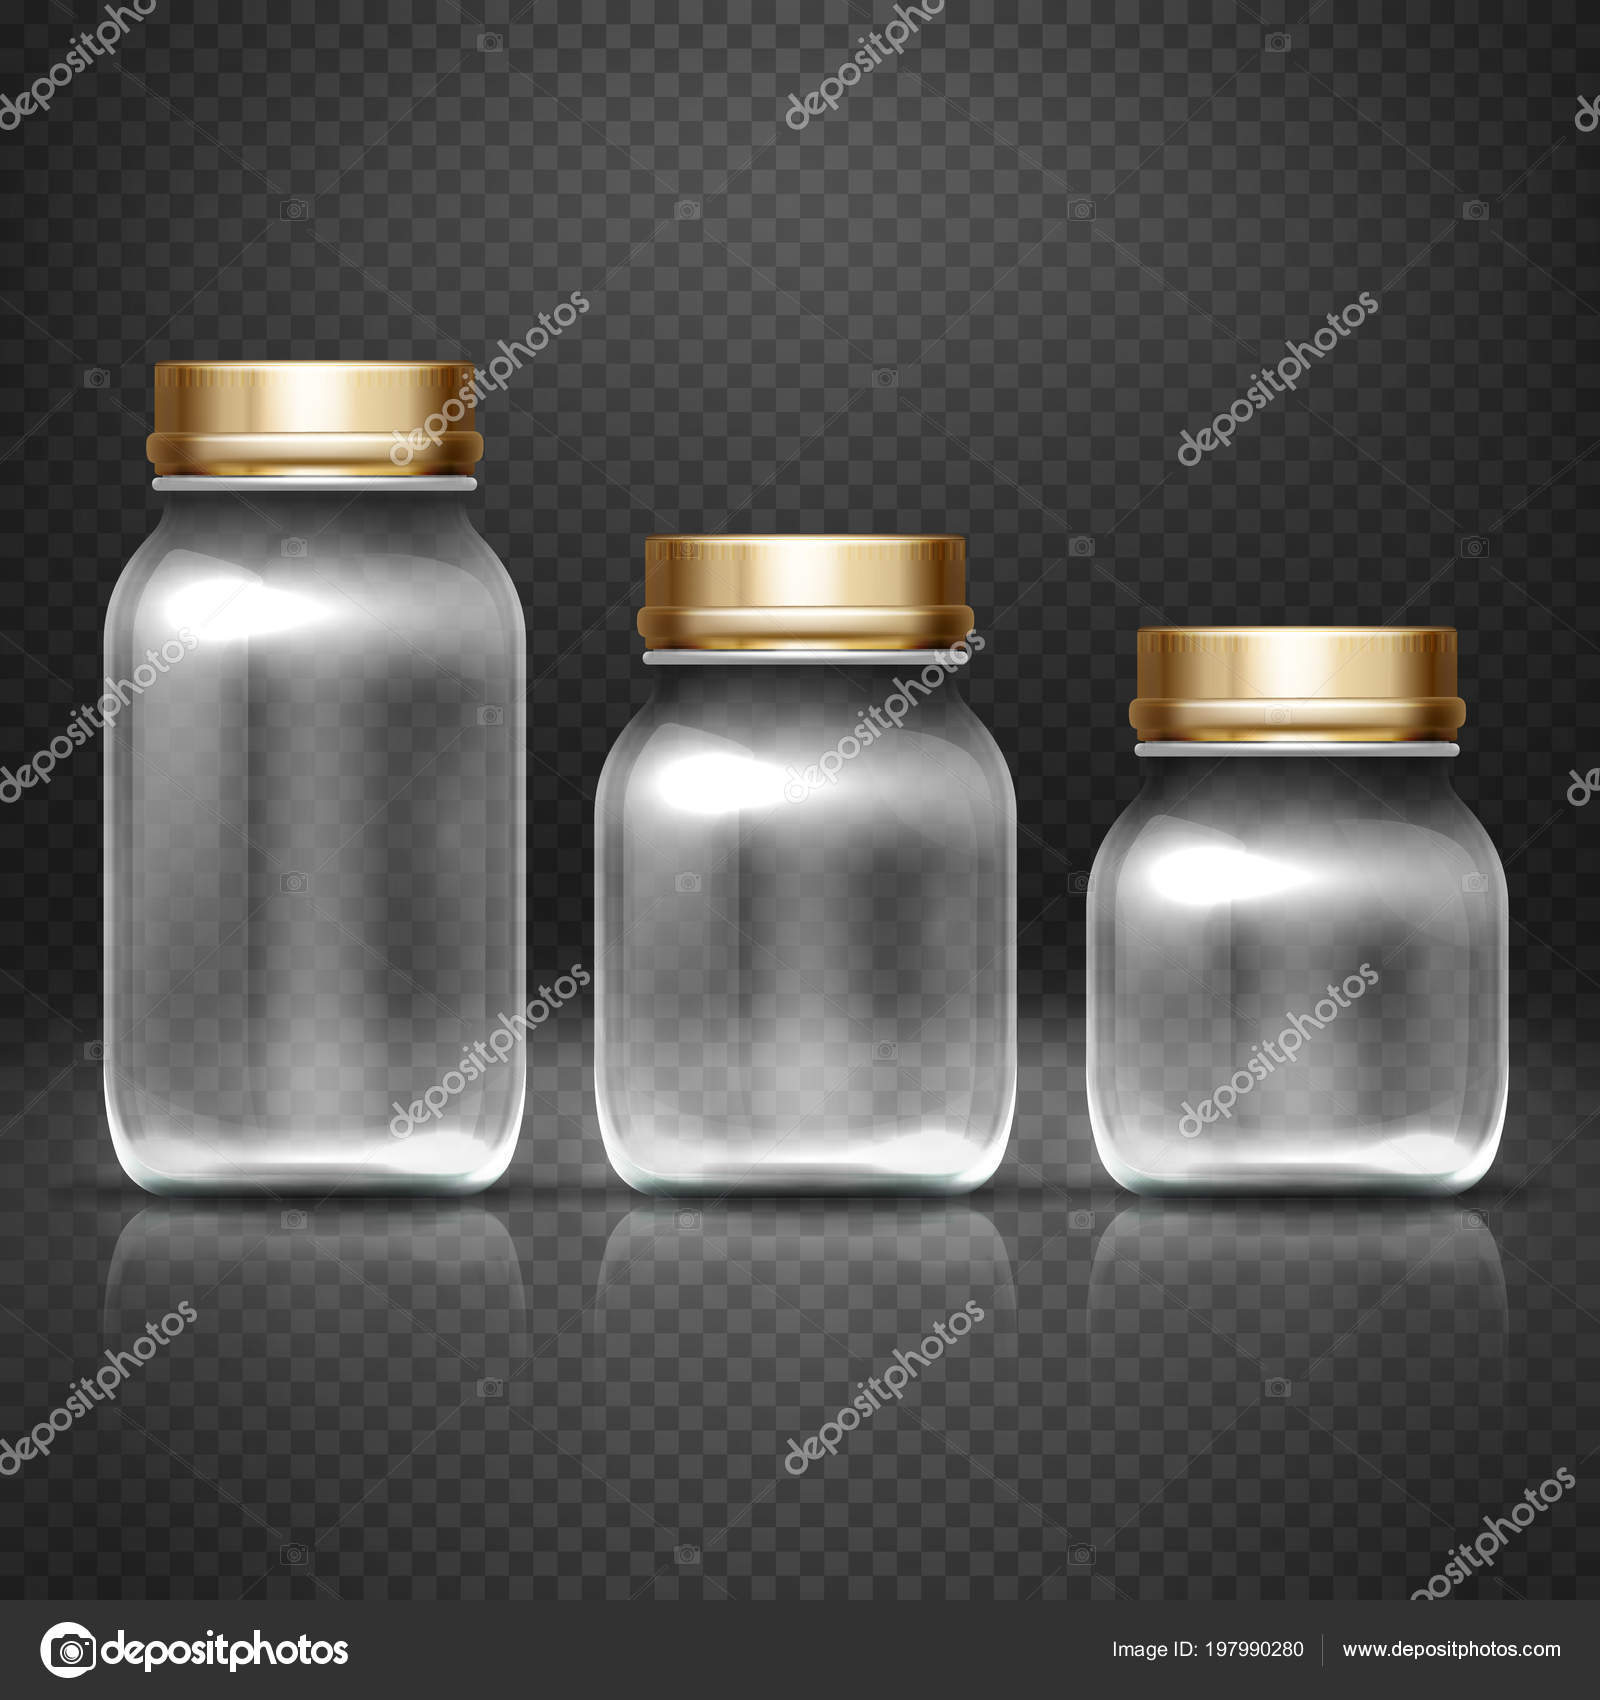 kitchen jars remodeling chicago 带检测限的空玻璃罐子厨房罐头保存向量集 图库矢量图像 c microone 图库矢量图片